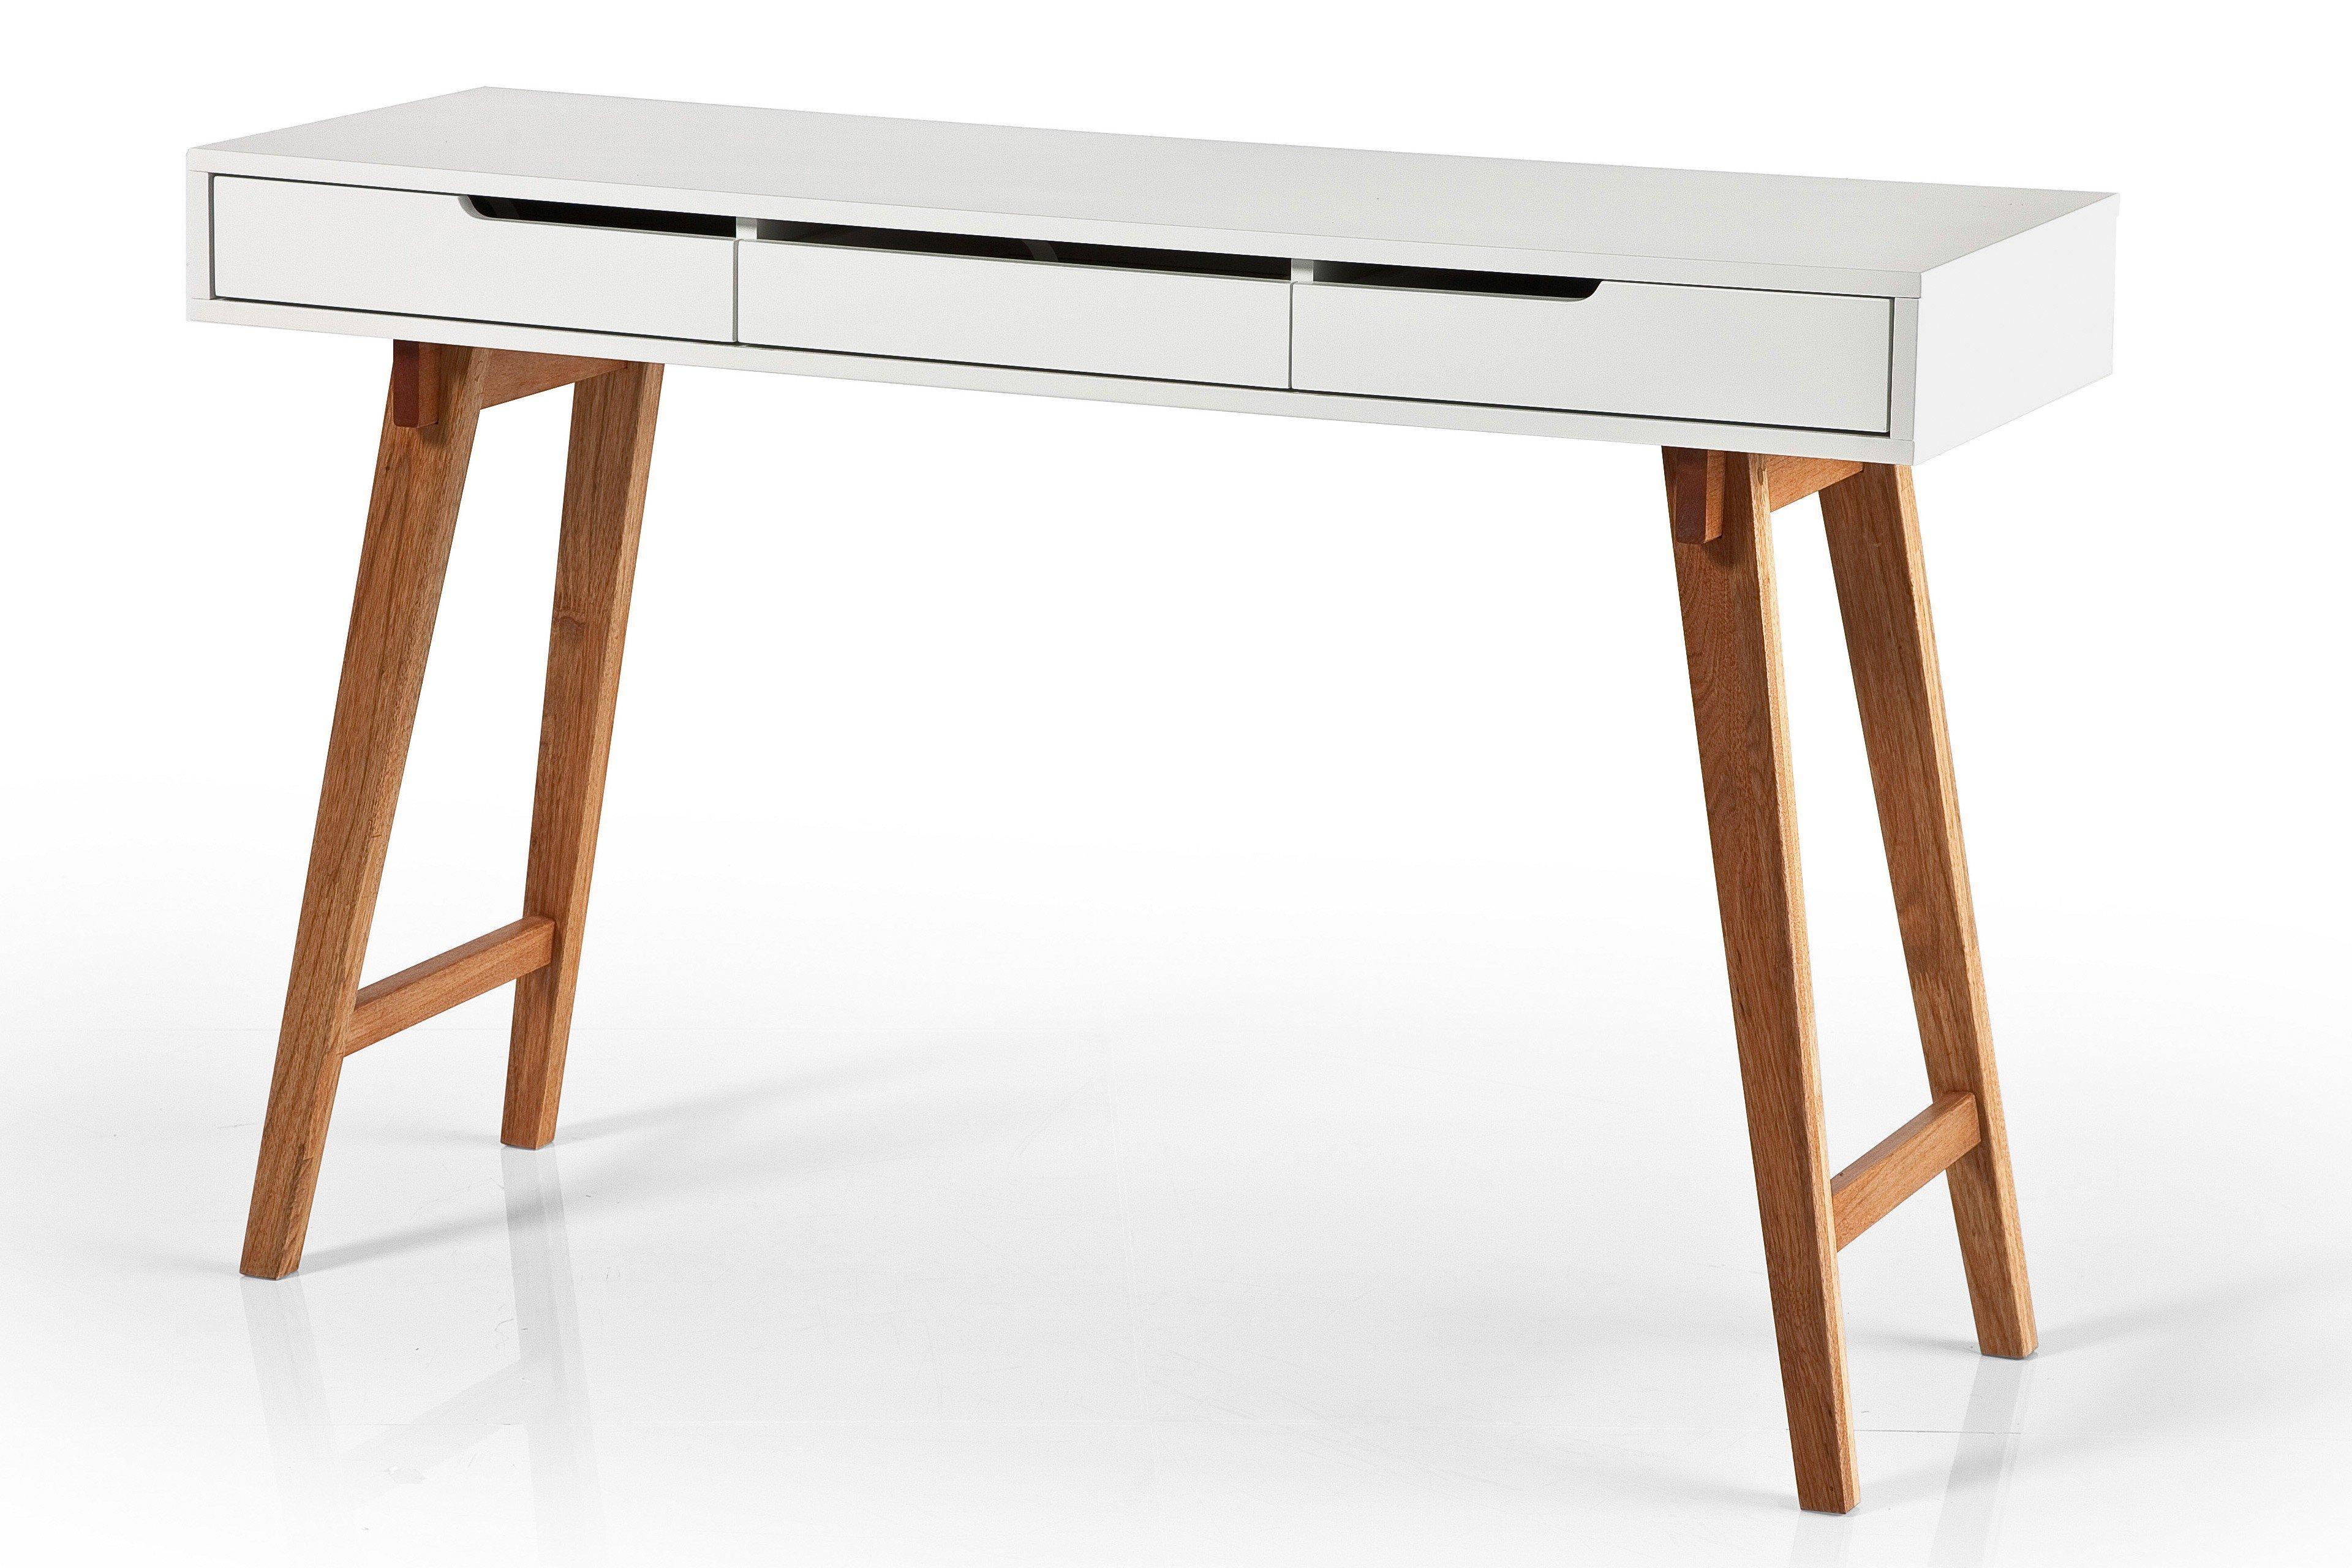 garderobe anneke drucill wei buche mca furniture. Black Bedroom Furniture Sets. Home Design Ideas